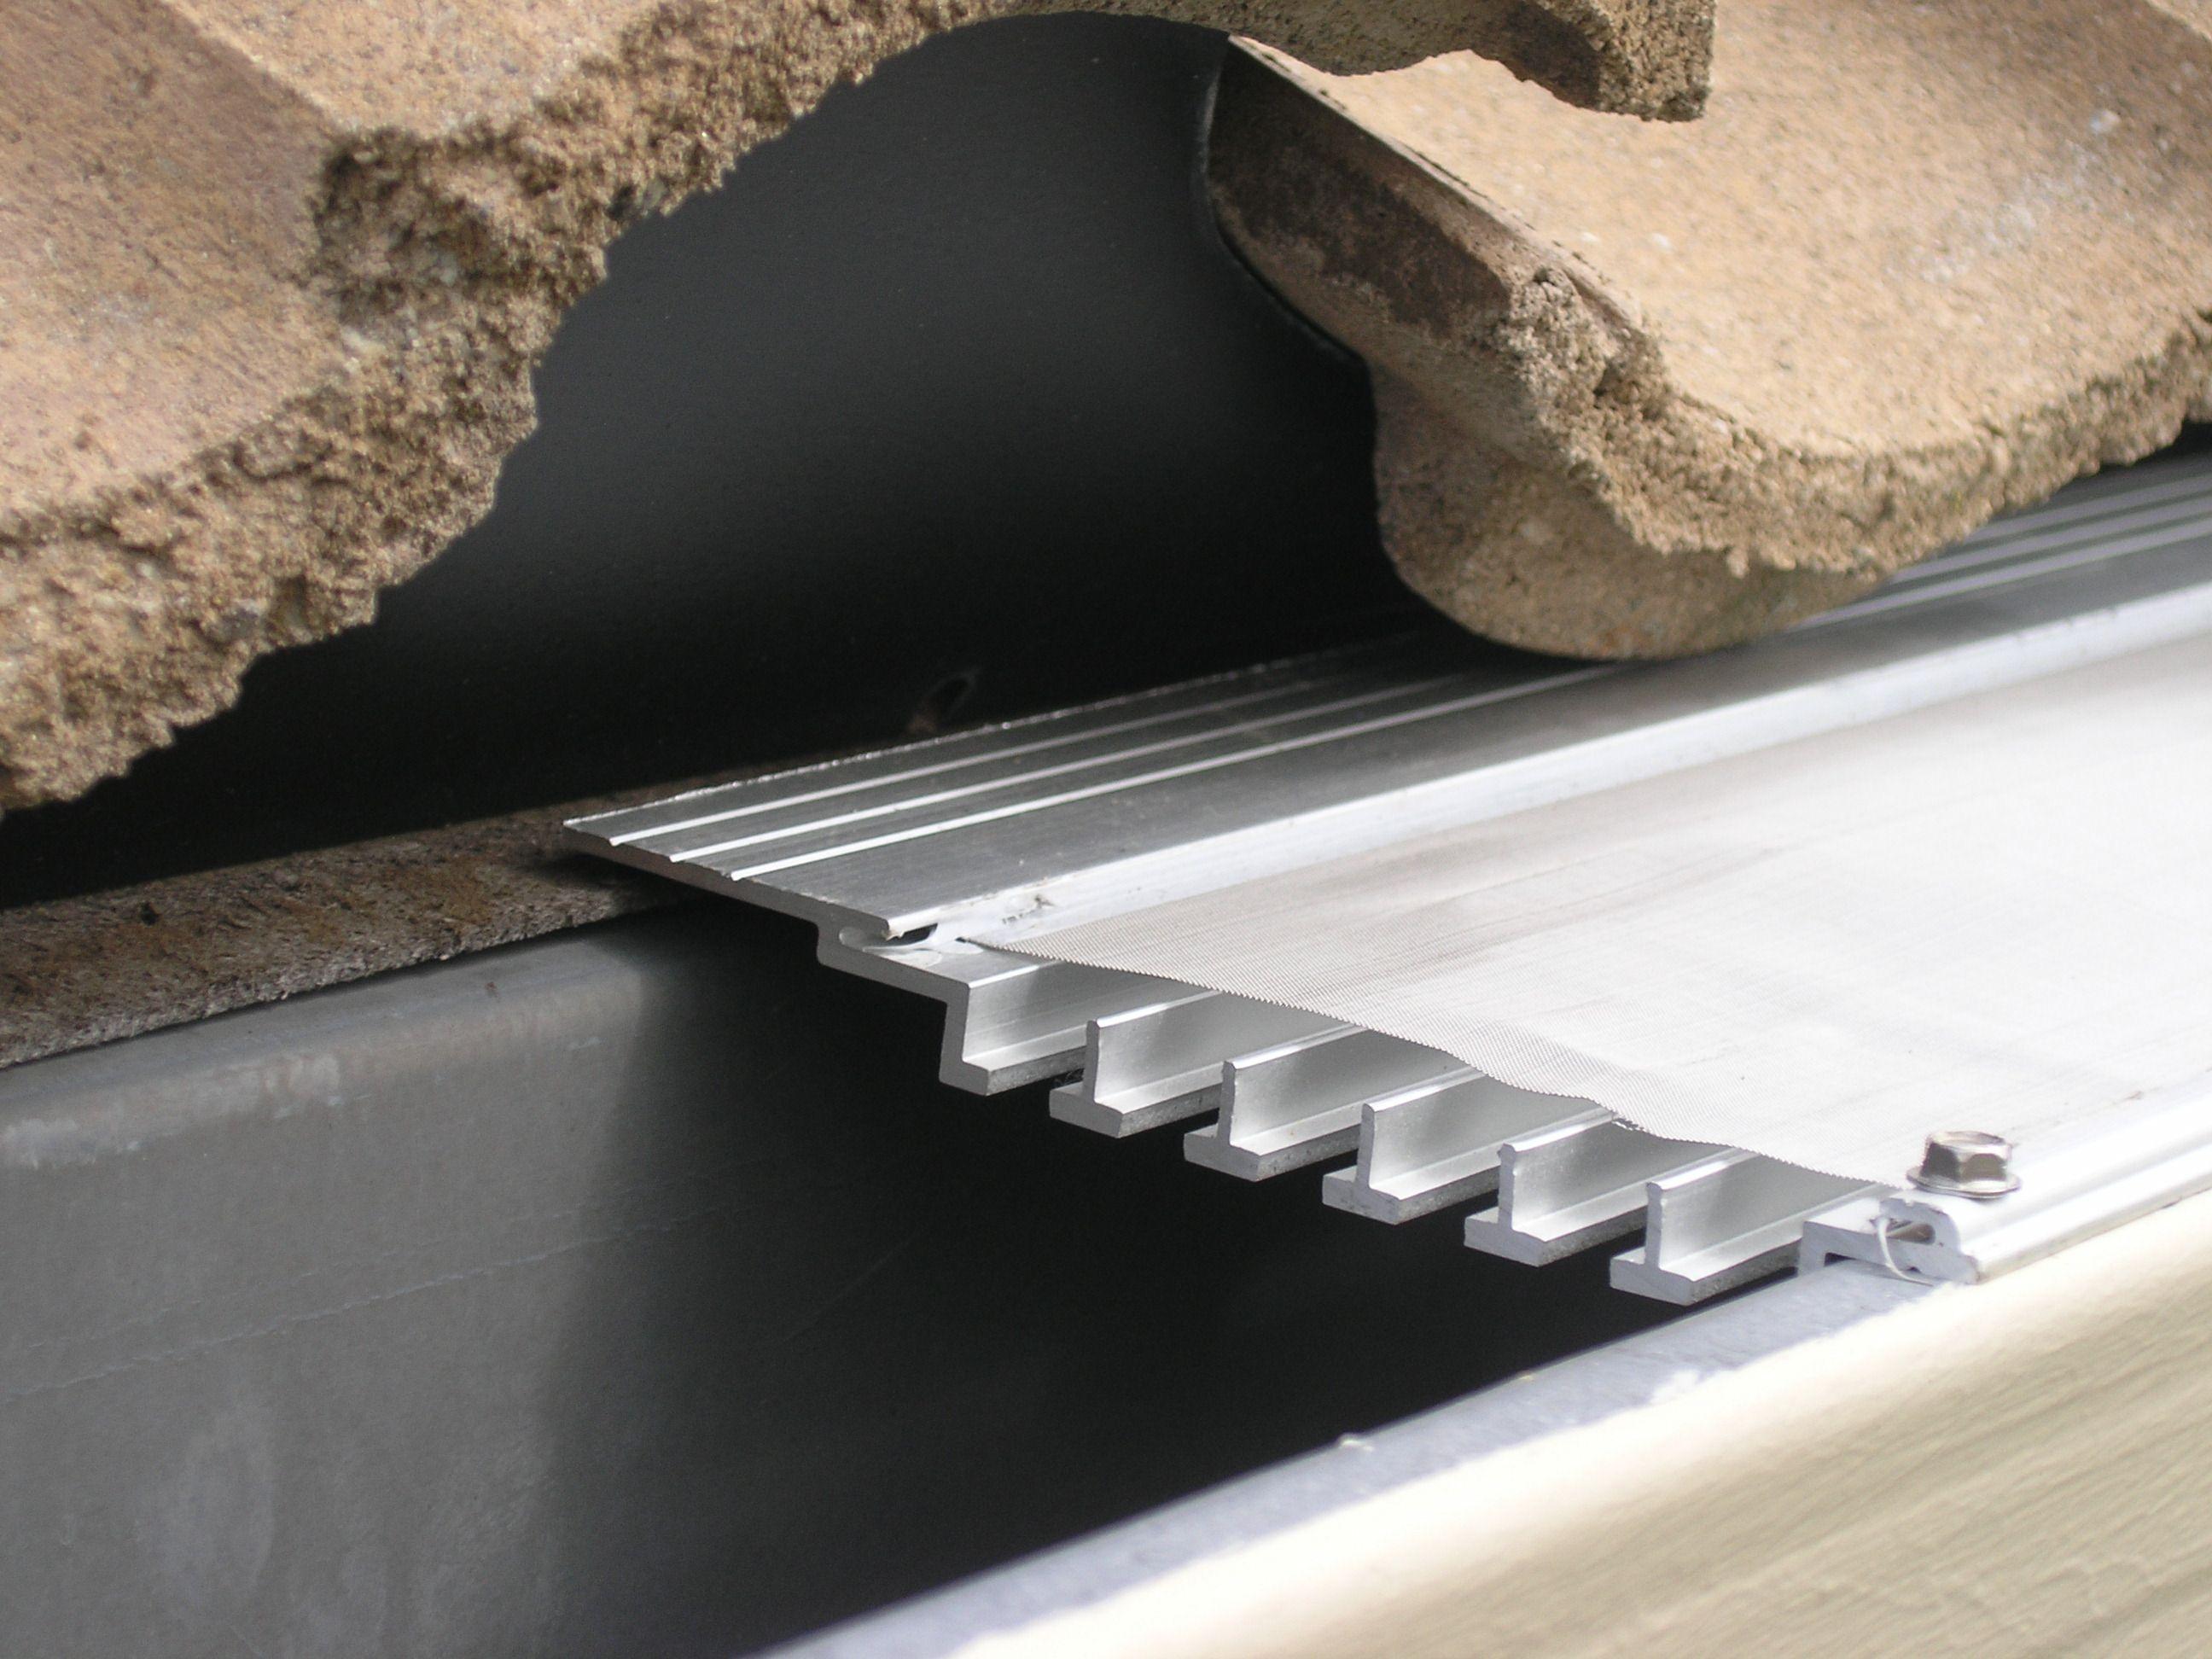 Ceramic Concrete Tile Roof Gutter Protection Concrete Tiles Cleaning Gutters